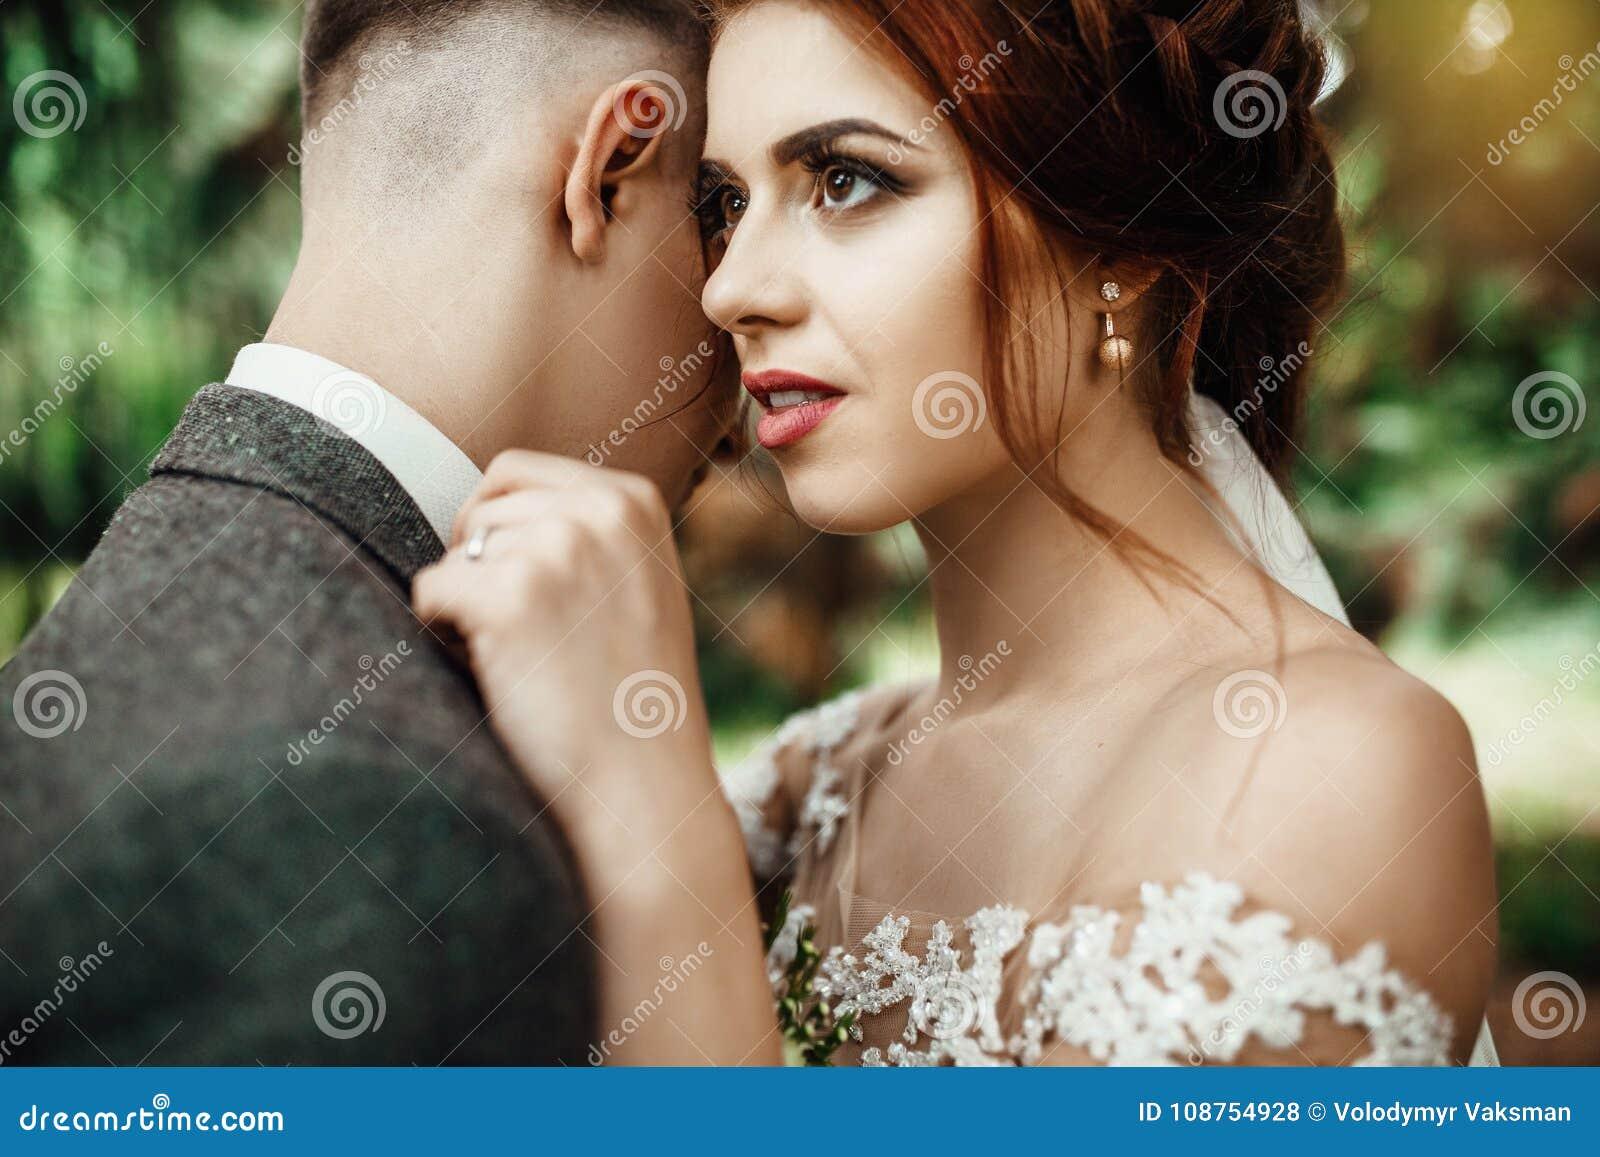 Portrait Of The Beautiful Romantic Couple Outside Stock Photo Image Of Georgia Model 108754928